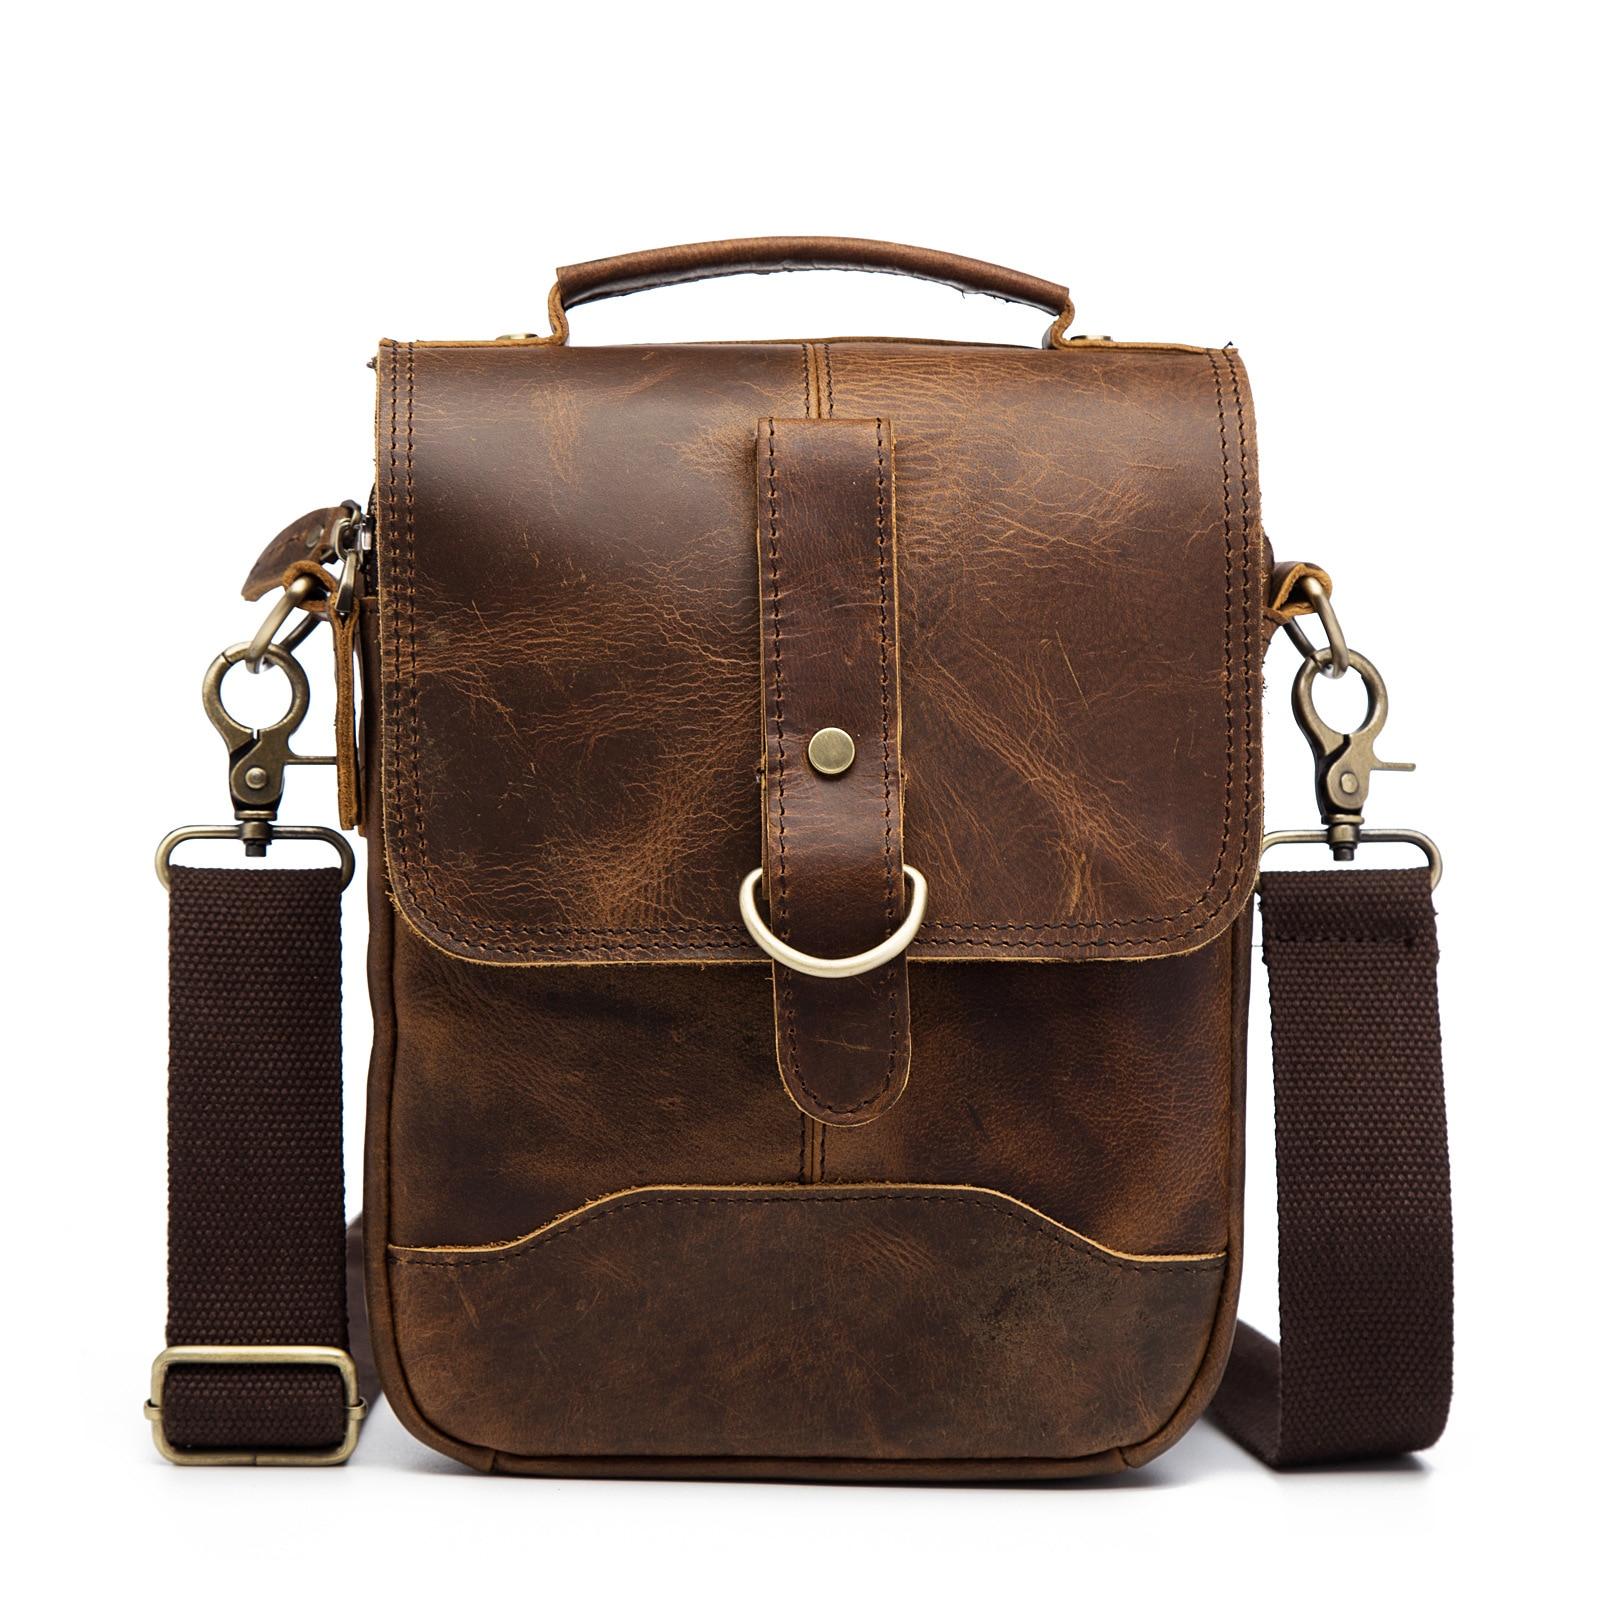 8' Crazy Horse sac à main en cuir véritable sac à bandoulière pour hommes sac à bandoulière pour hommes sacs Messenger poignée mâle sac décontracté pour Ipad